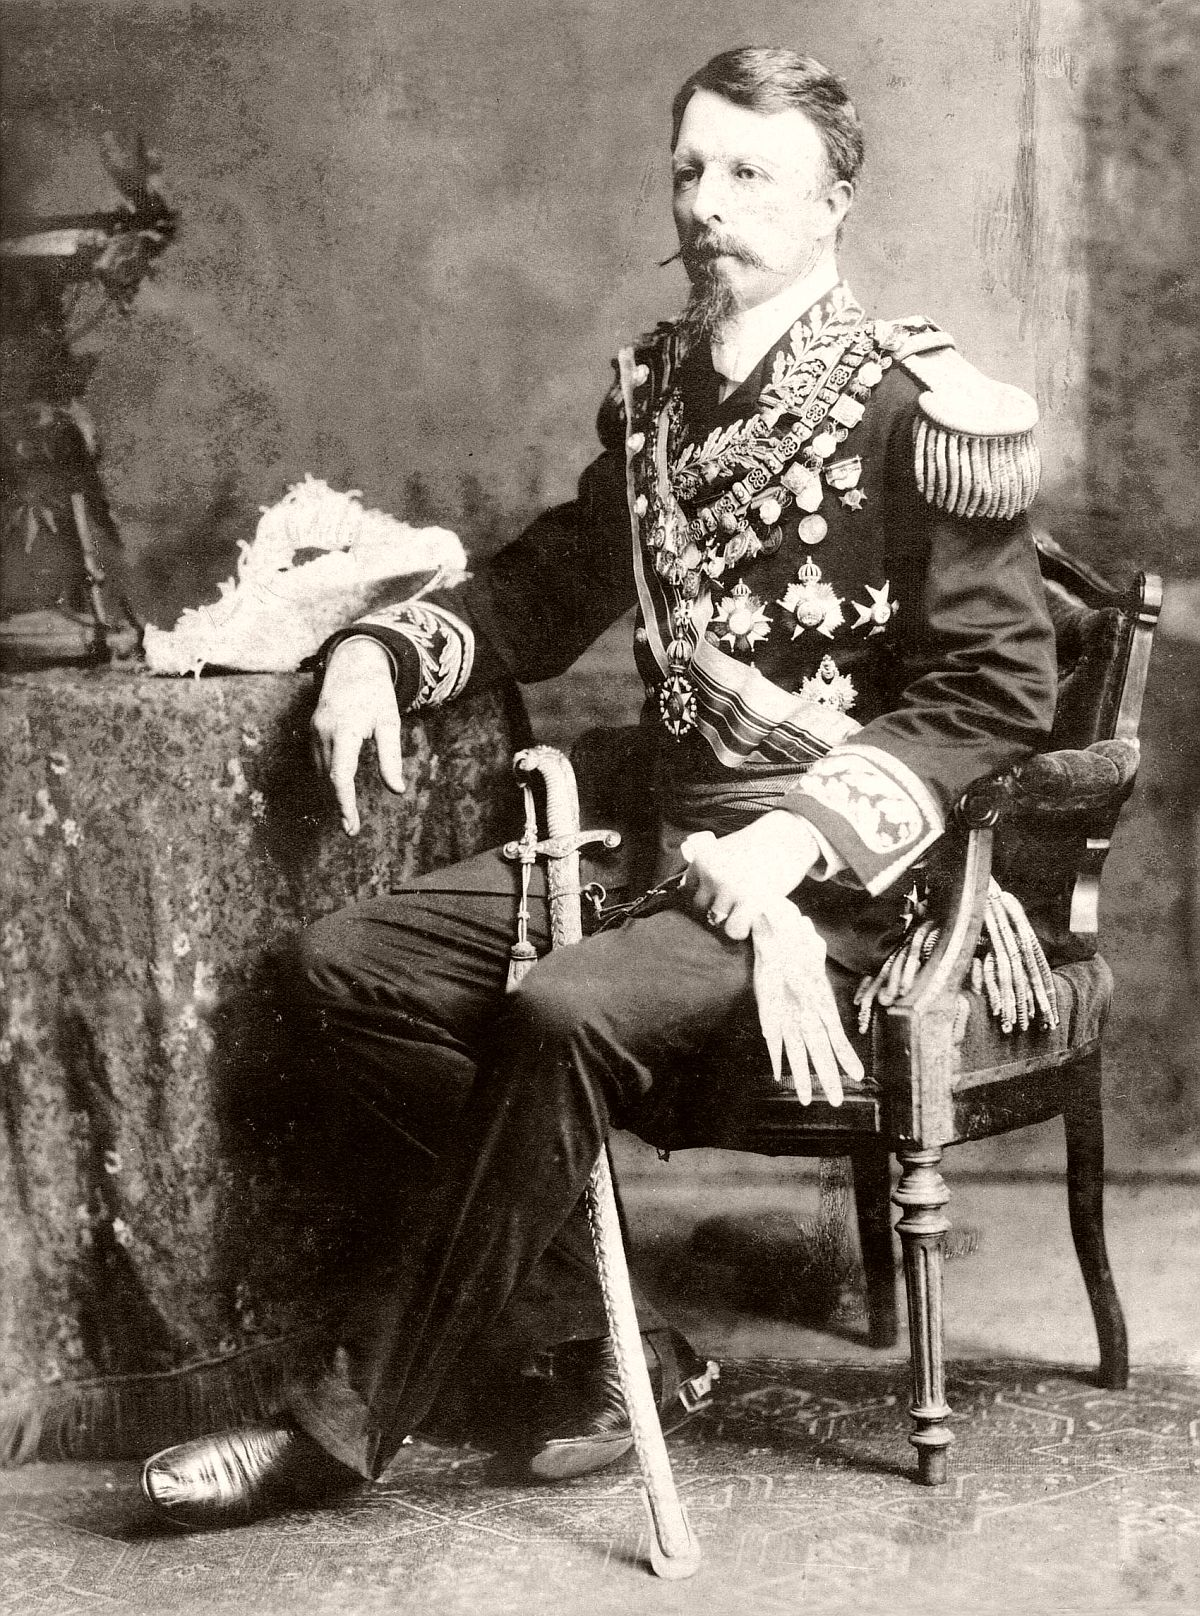 Prince Gaston of Orléans, Count of Eu or Dom Gastão de Orleães, Marshal of the Army. 1882